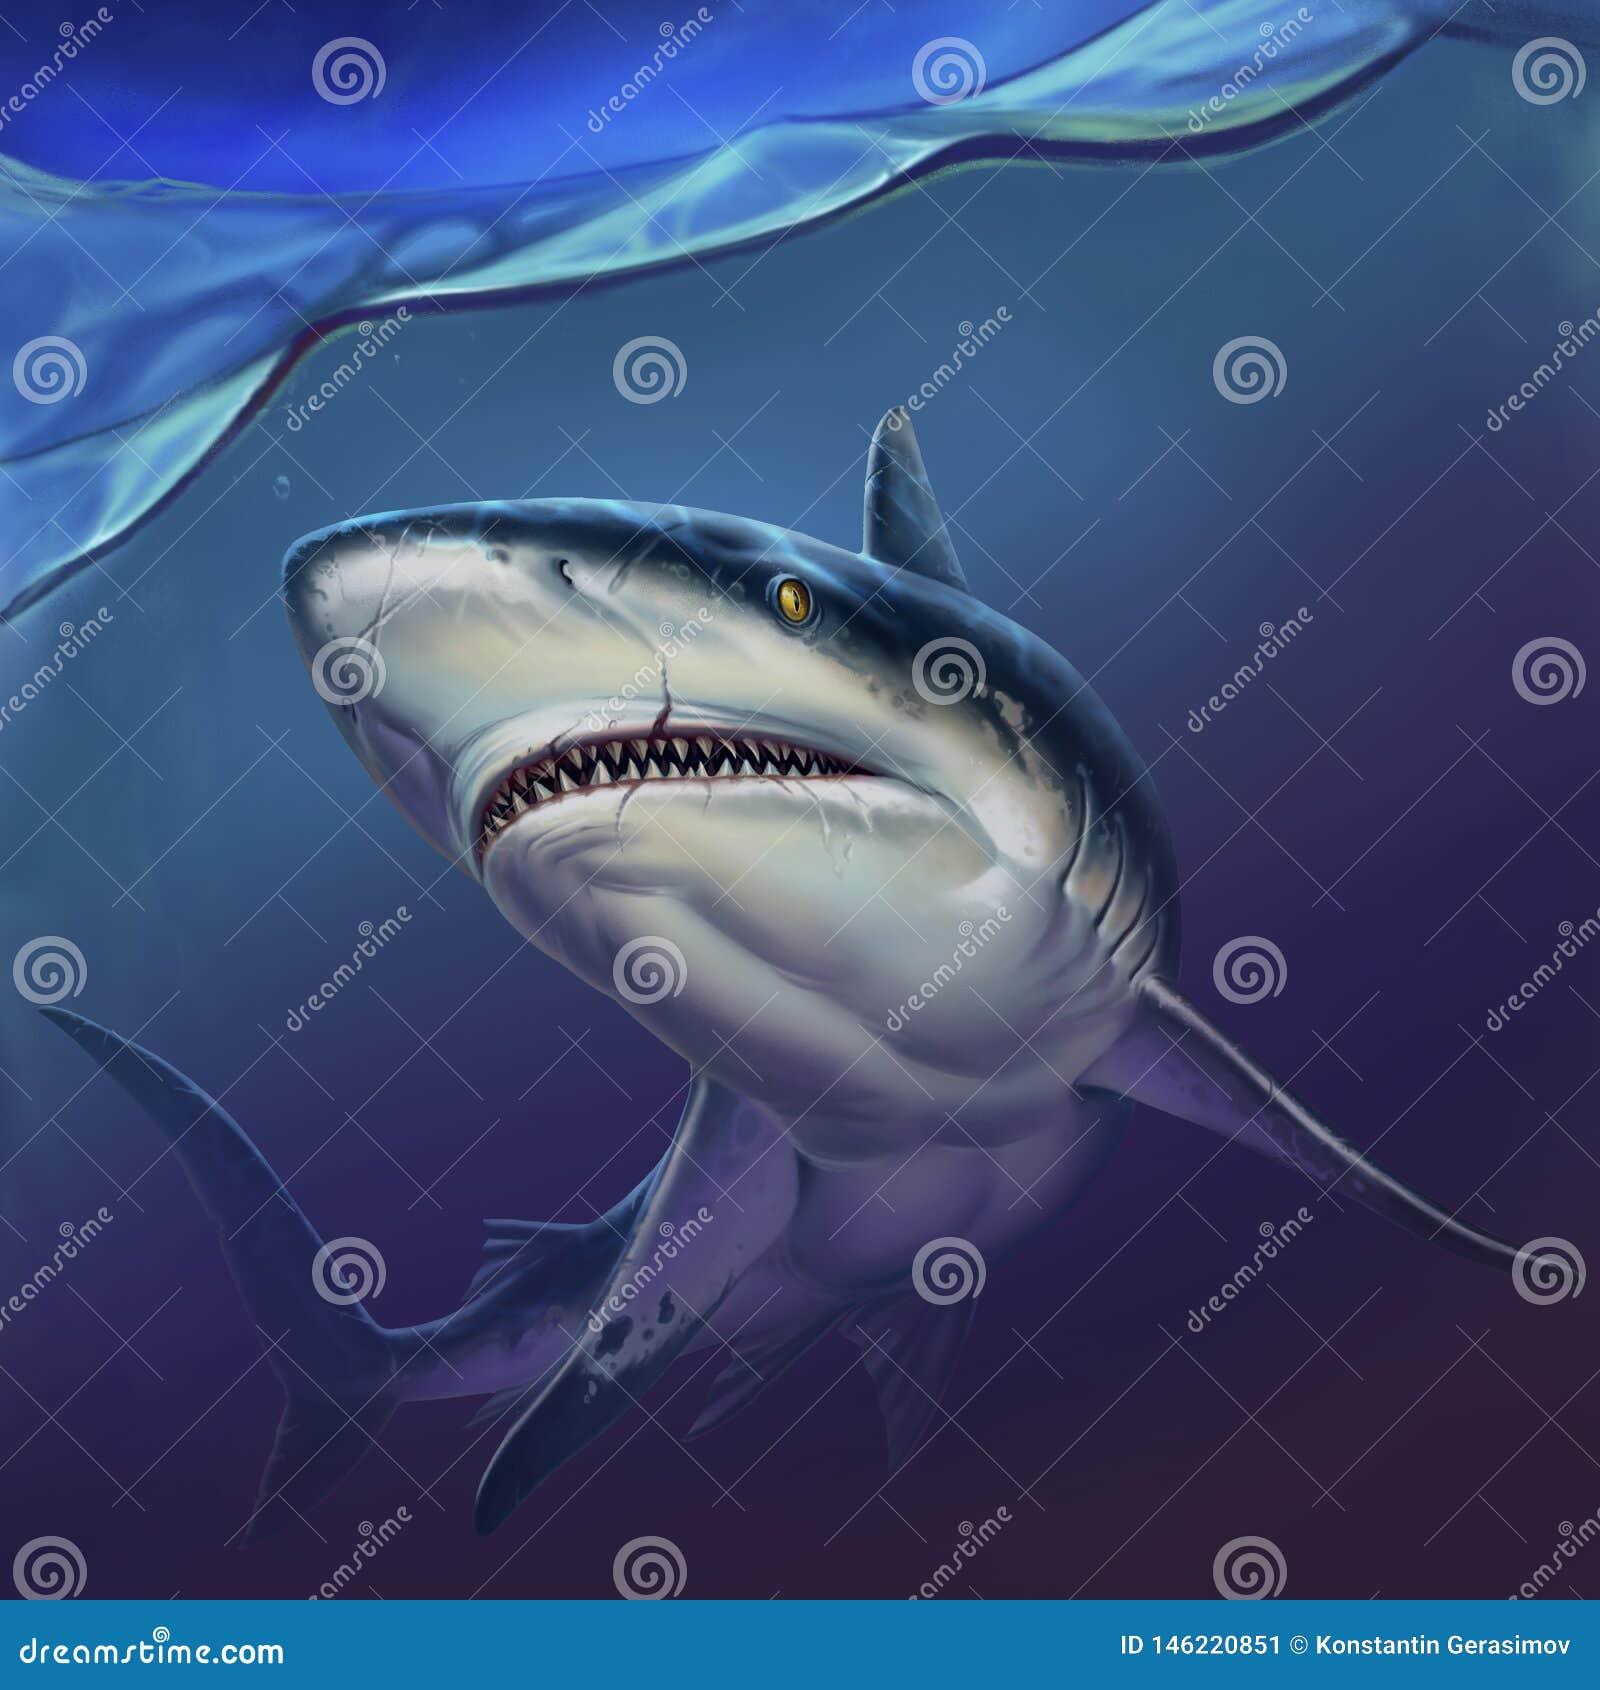 Reef shark on depth realistic background illustration.